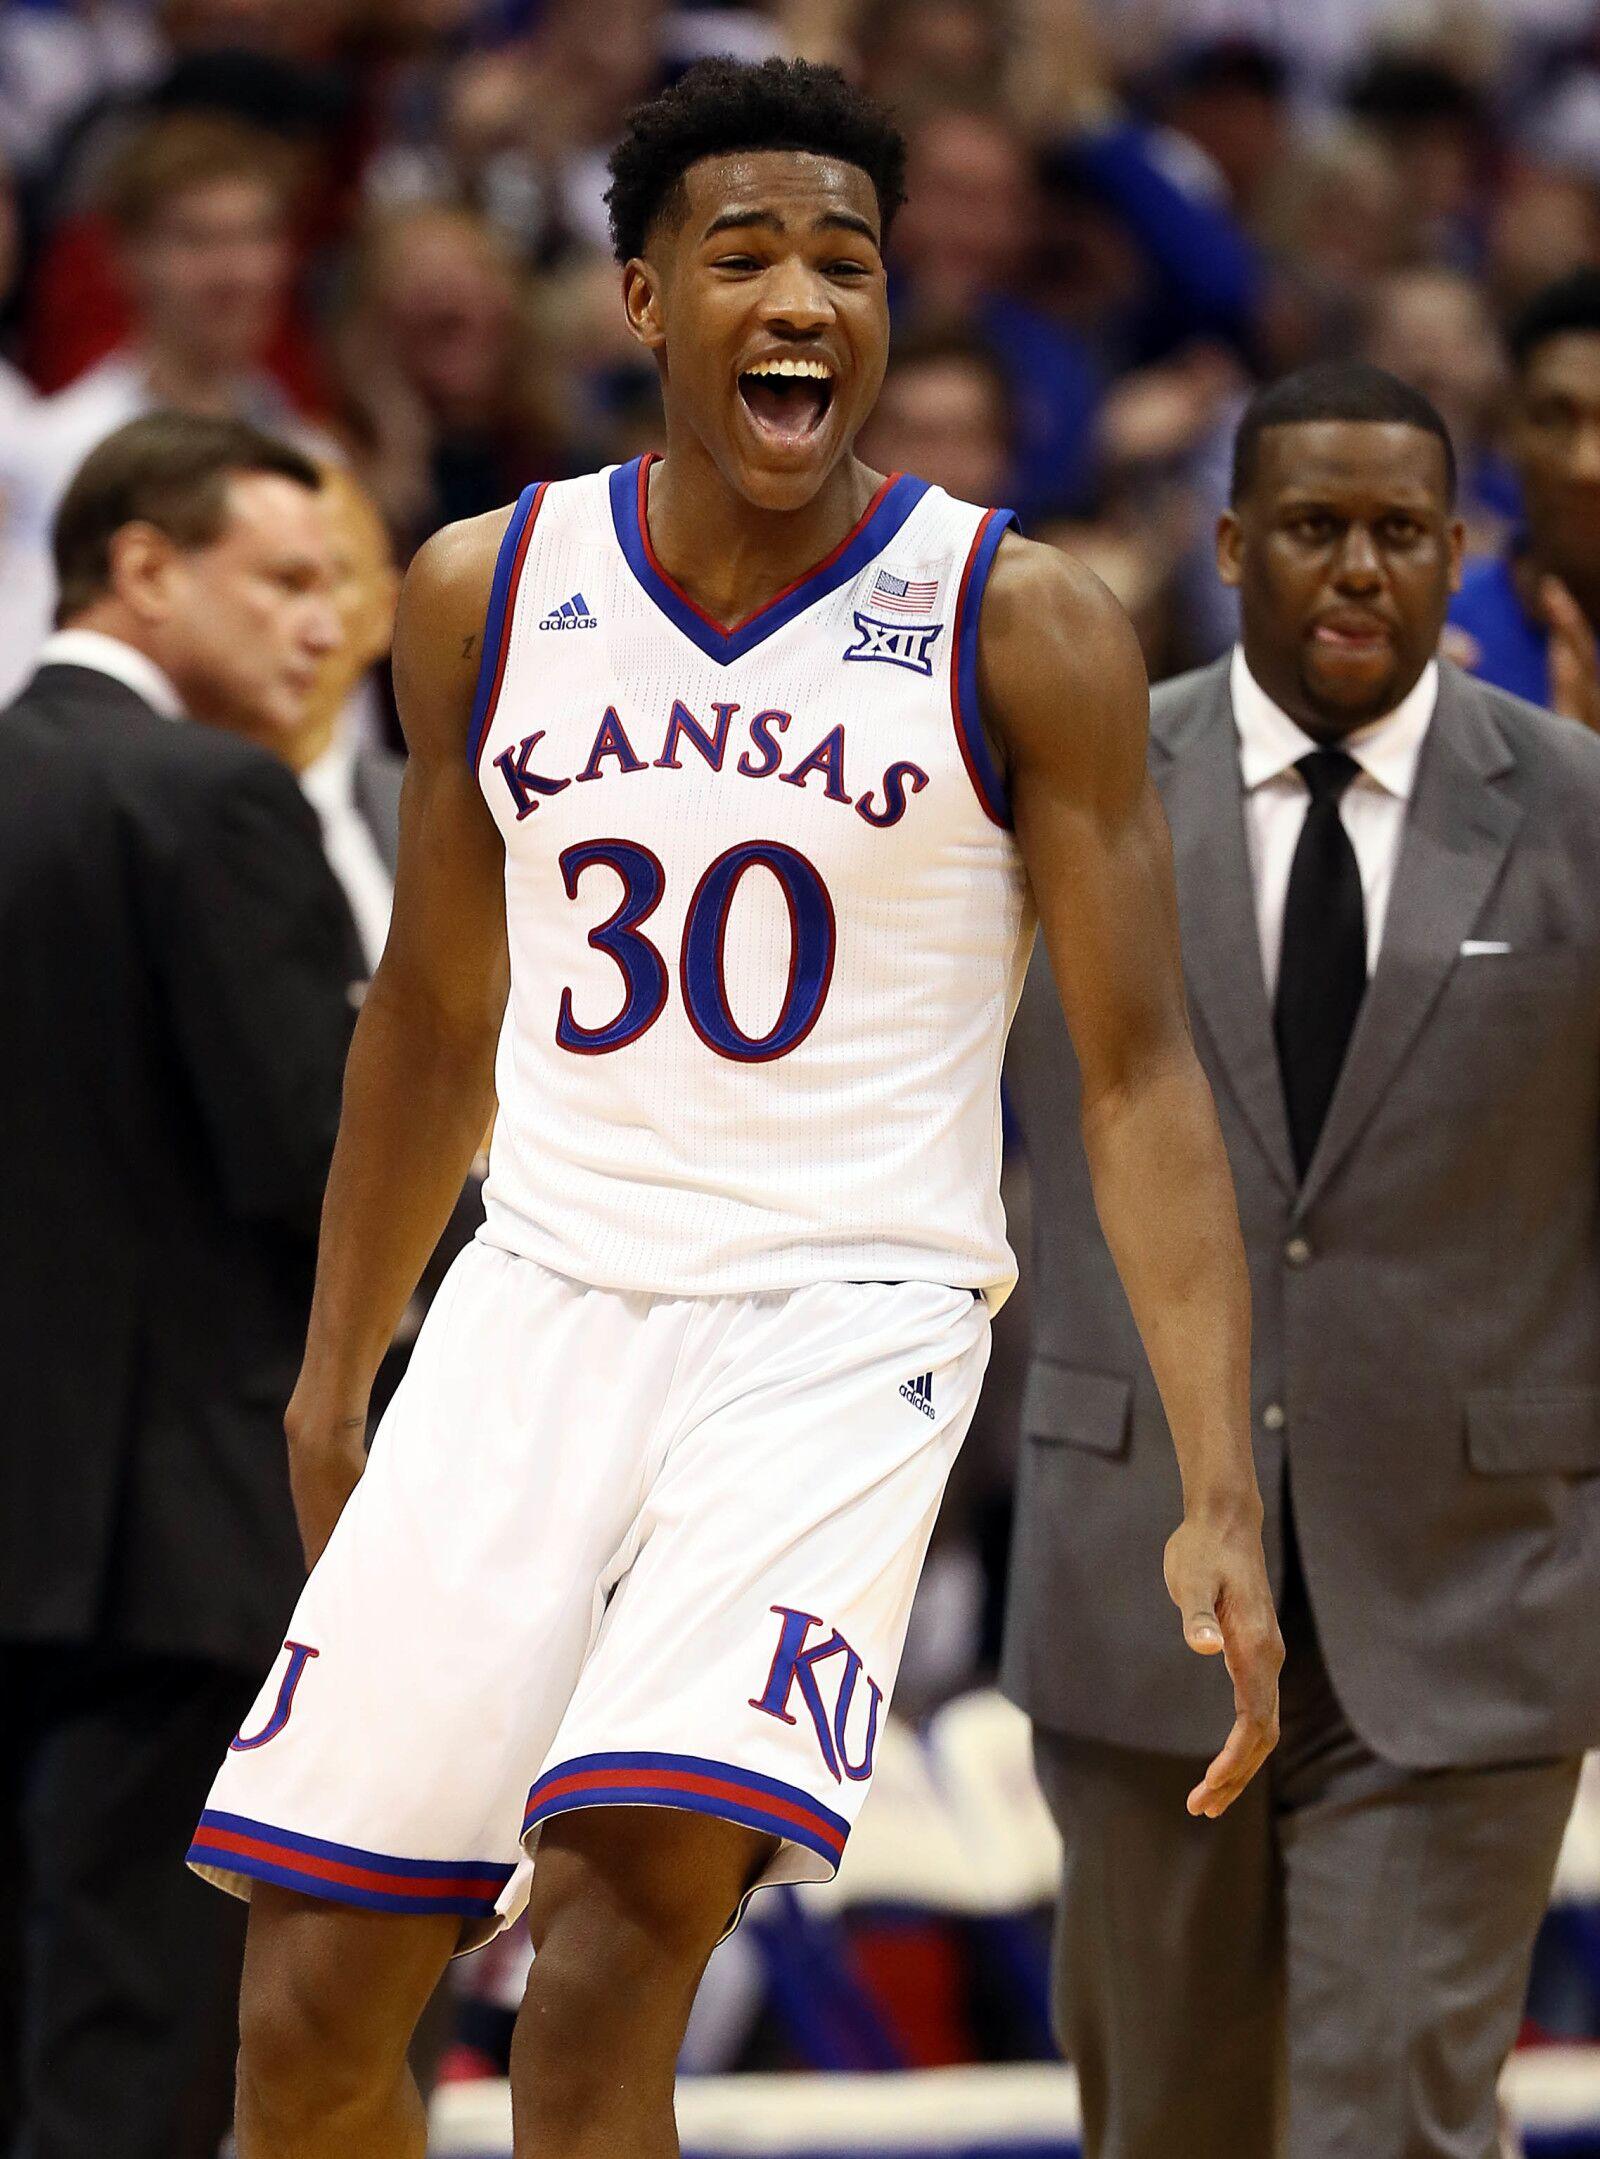 Kansas basketball player spotlight: Sophomore Ochai Agbaji